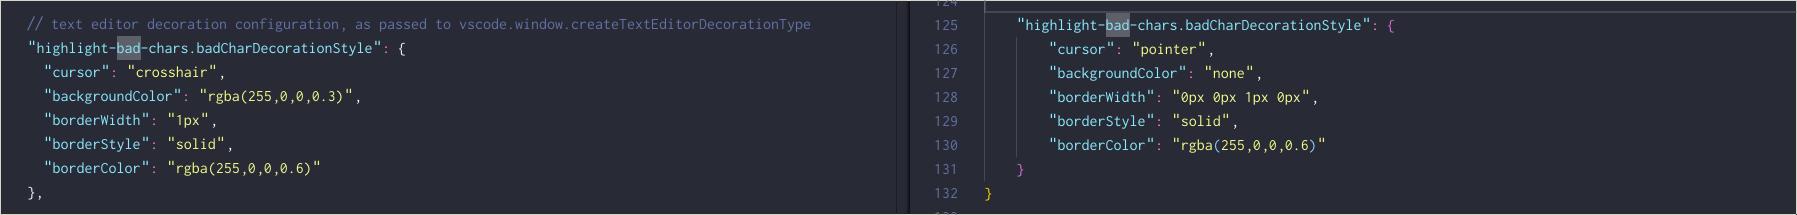 highlight-bad-chars-configuration